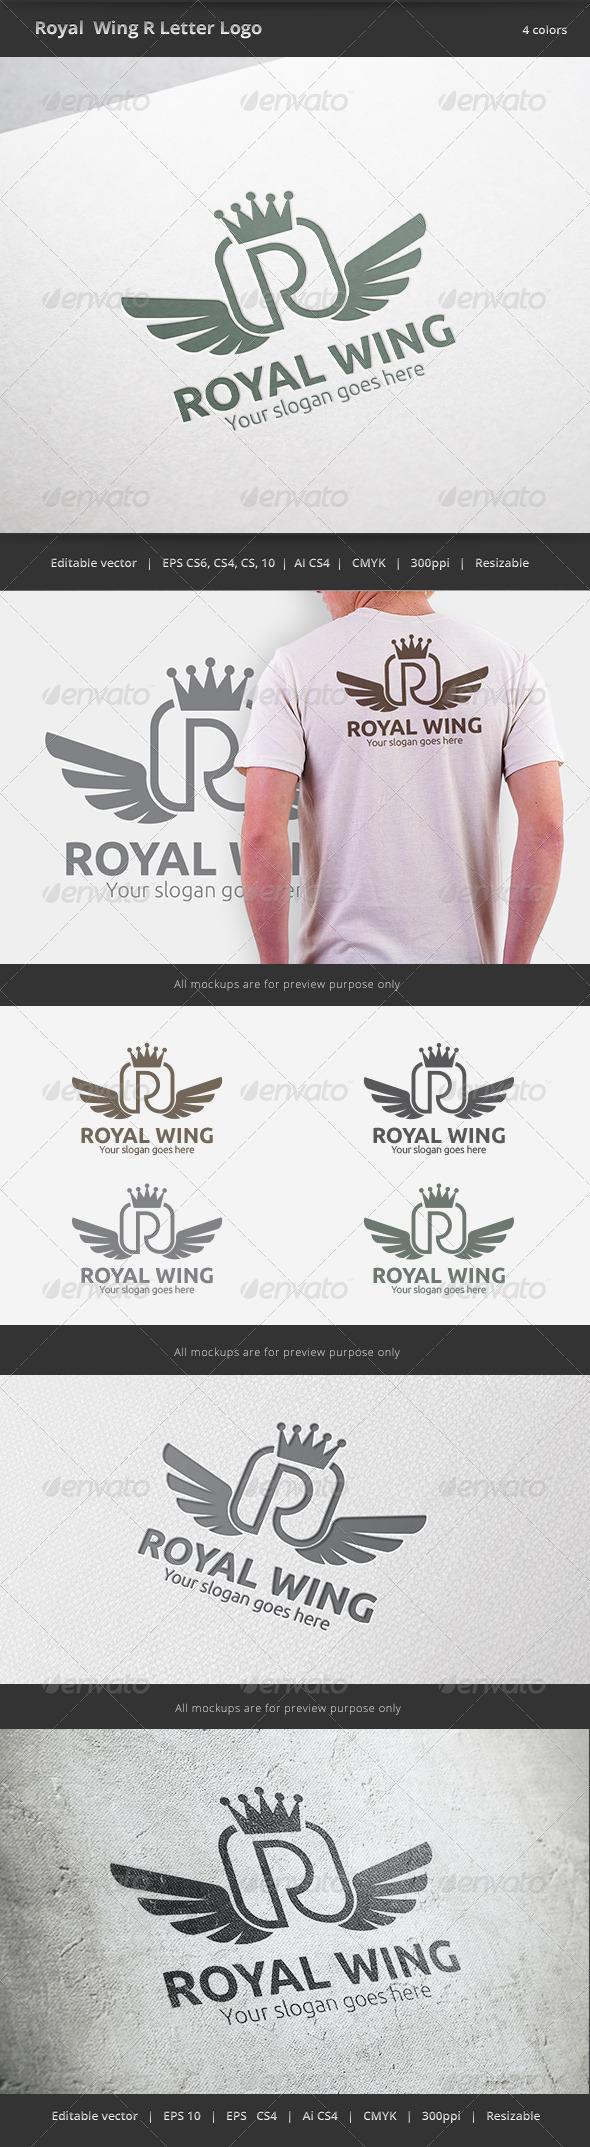 Royal Wing Letter R Logo - Letters Logo Templates